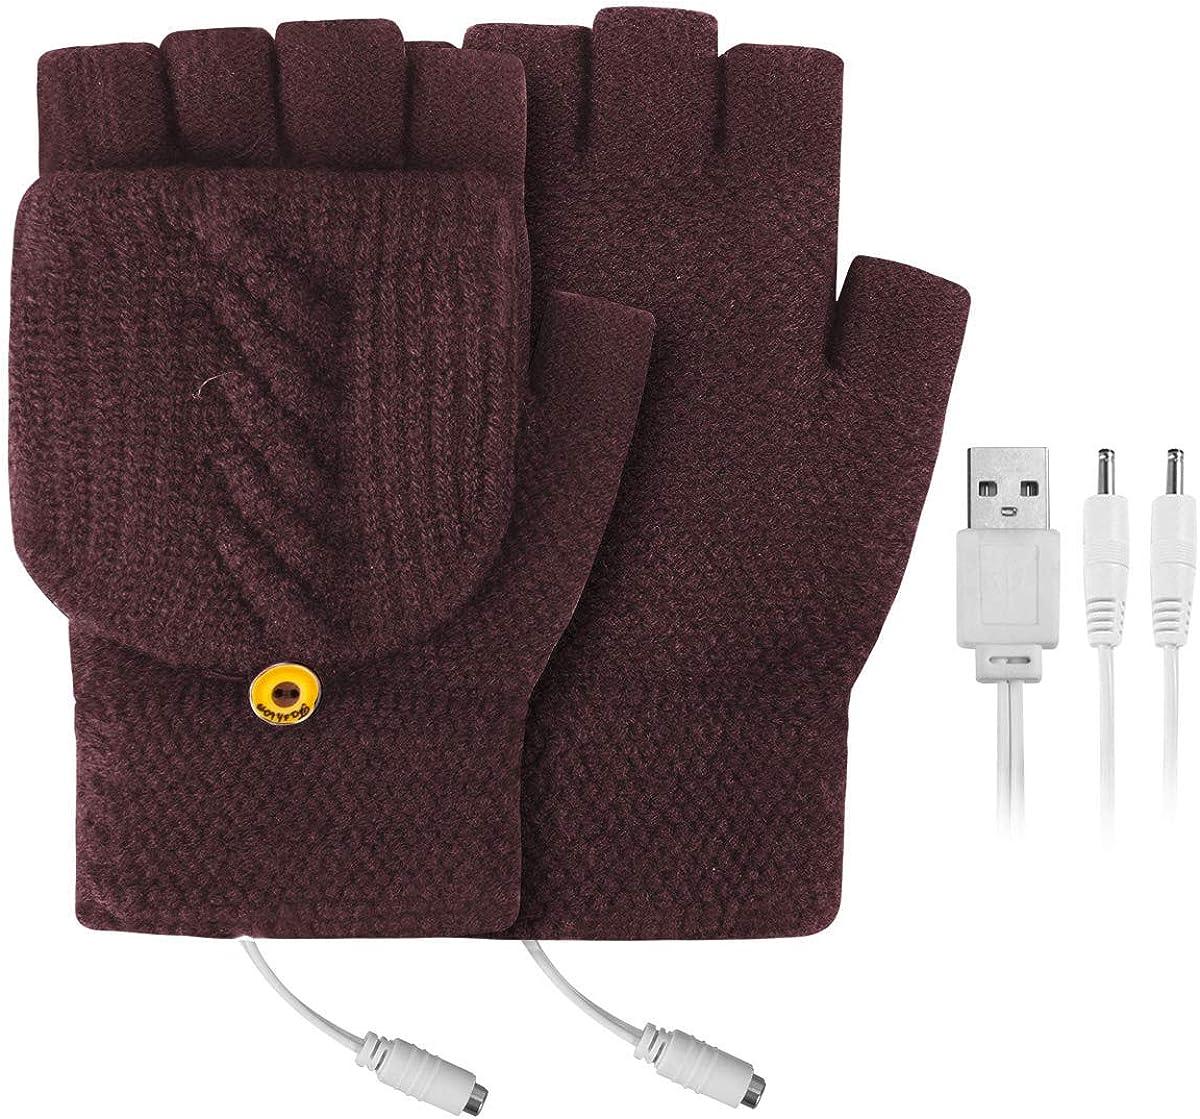 FAMKIT USB Heated Gloves Mitten,Winter Full & Half Fingers Warmer Laptop Gloves Mittens